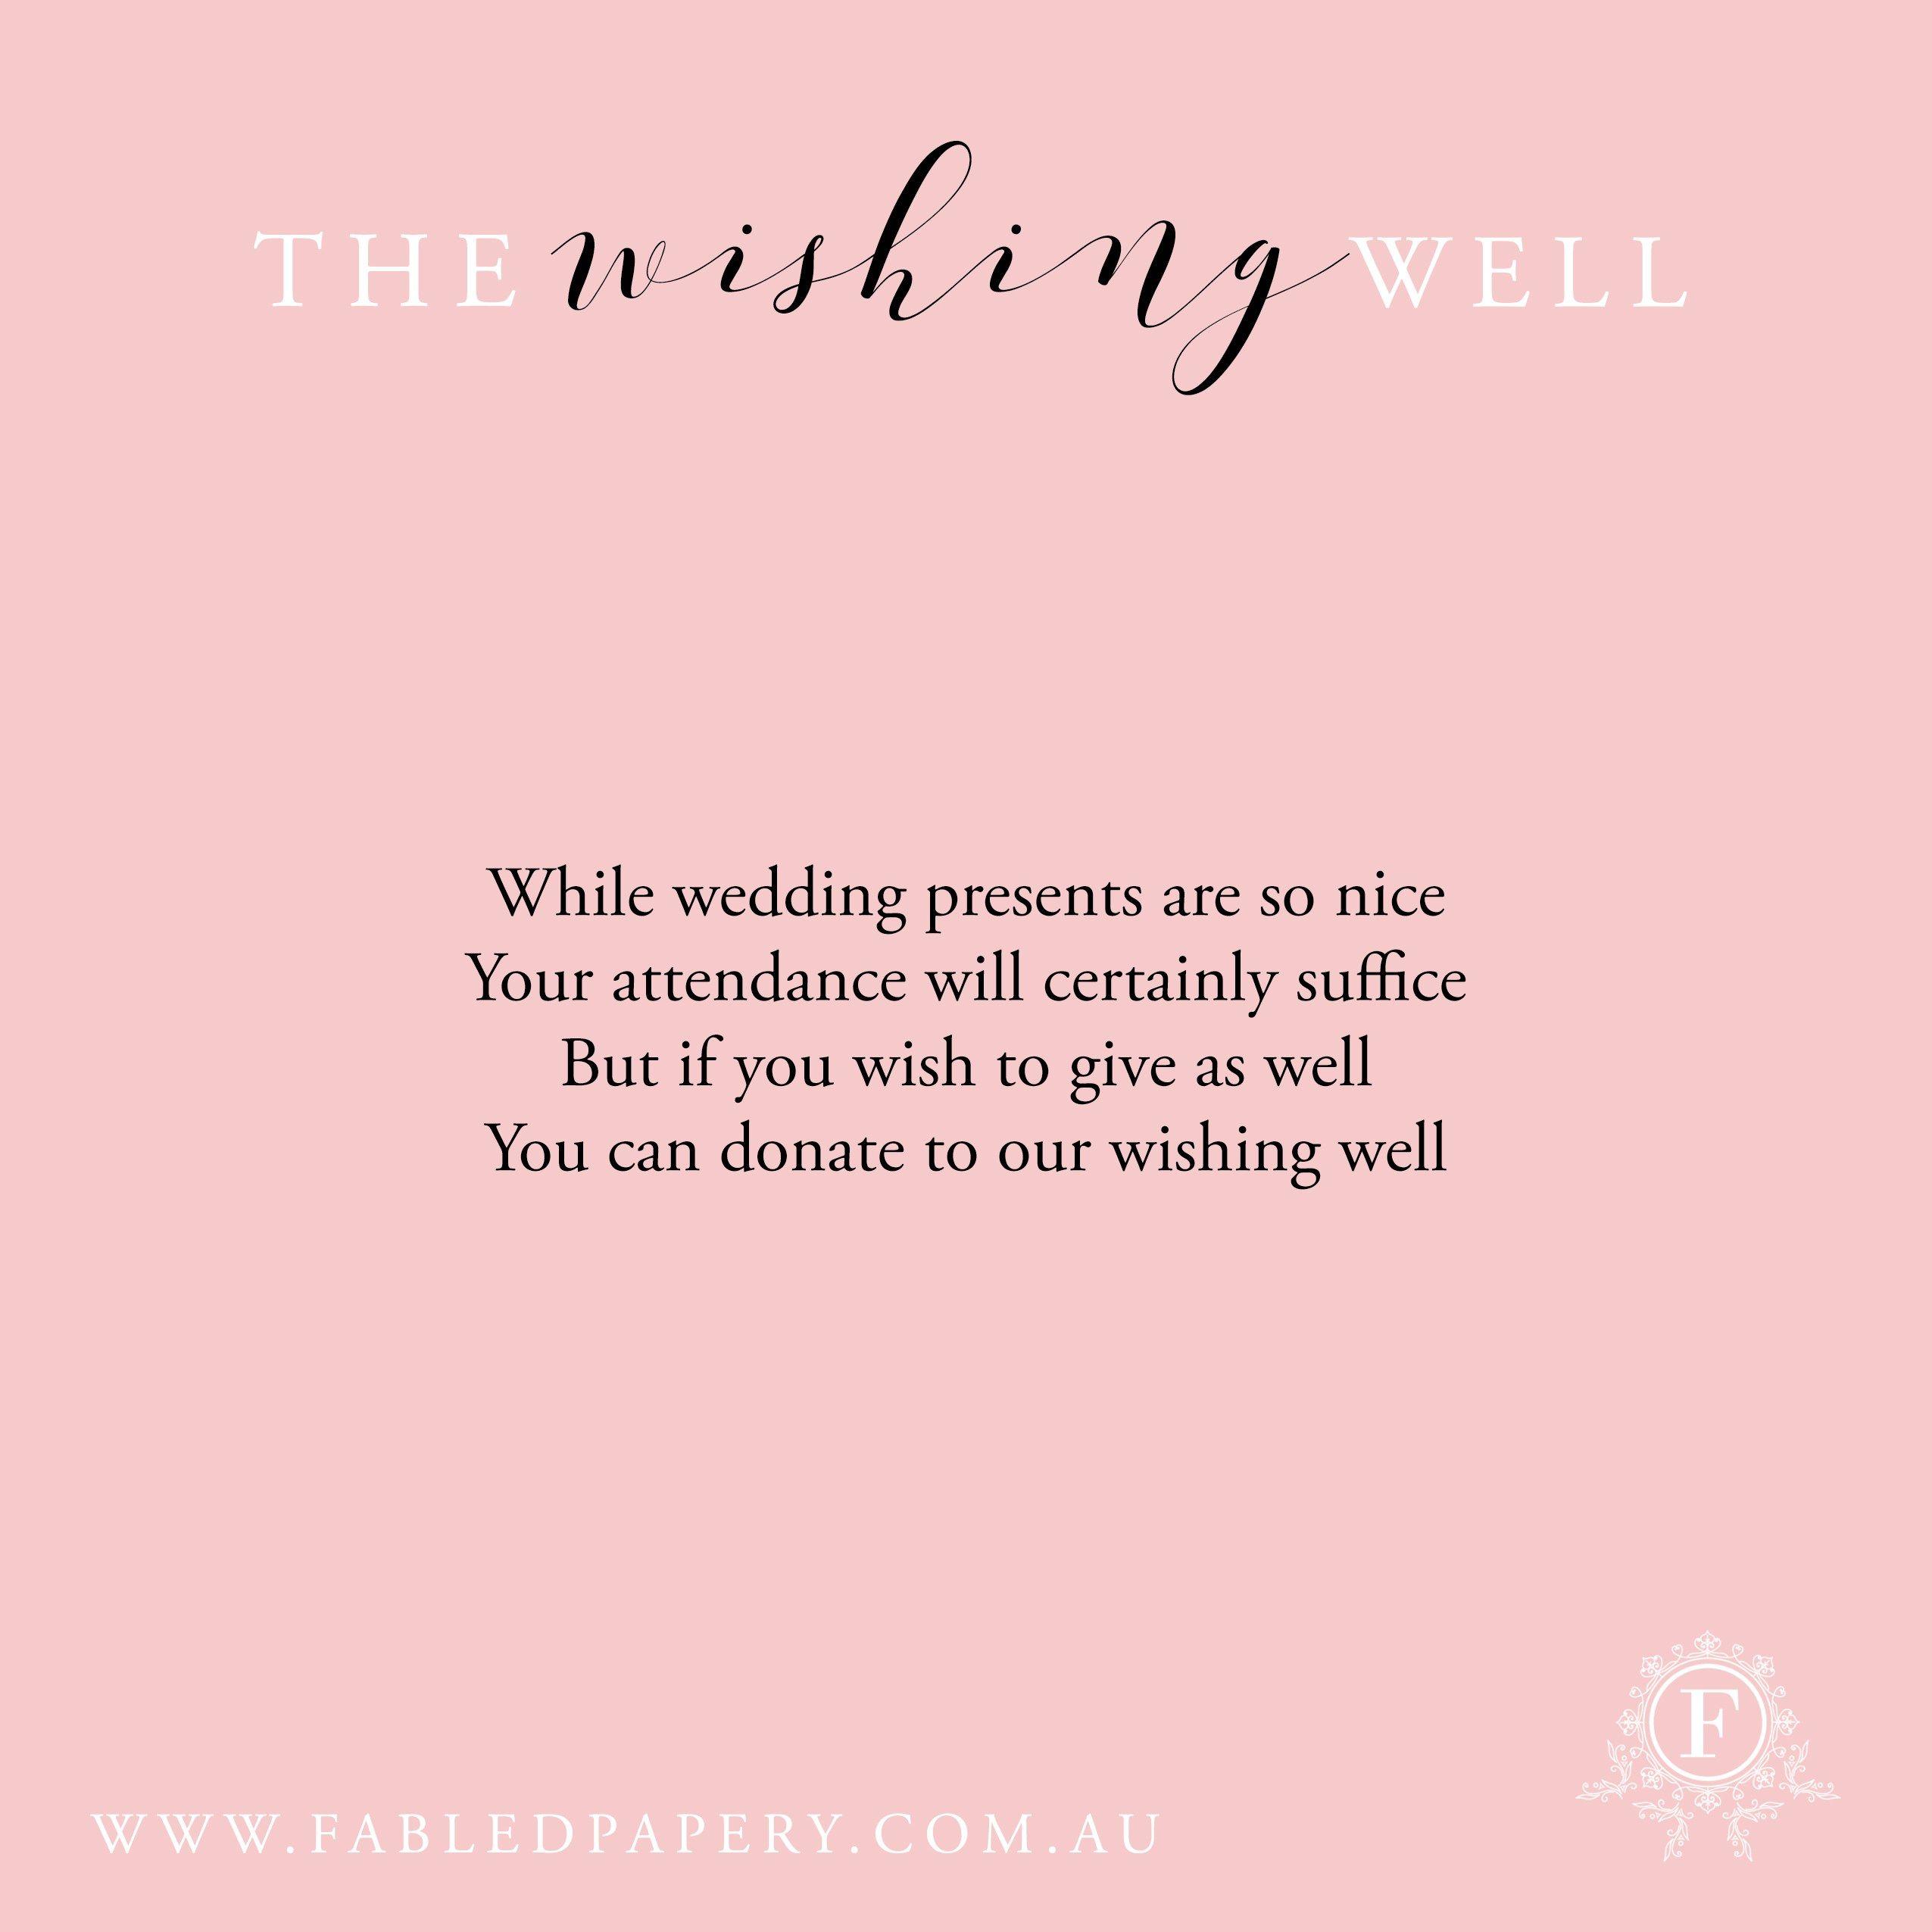 Spring Wedding Favours | Pinterest | Poem, Wedding and Weddings